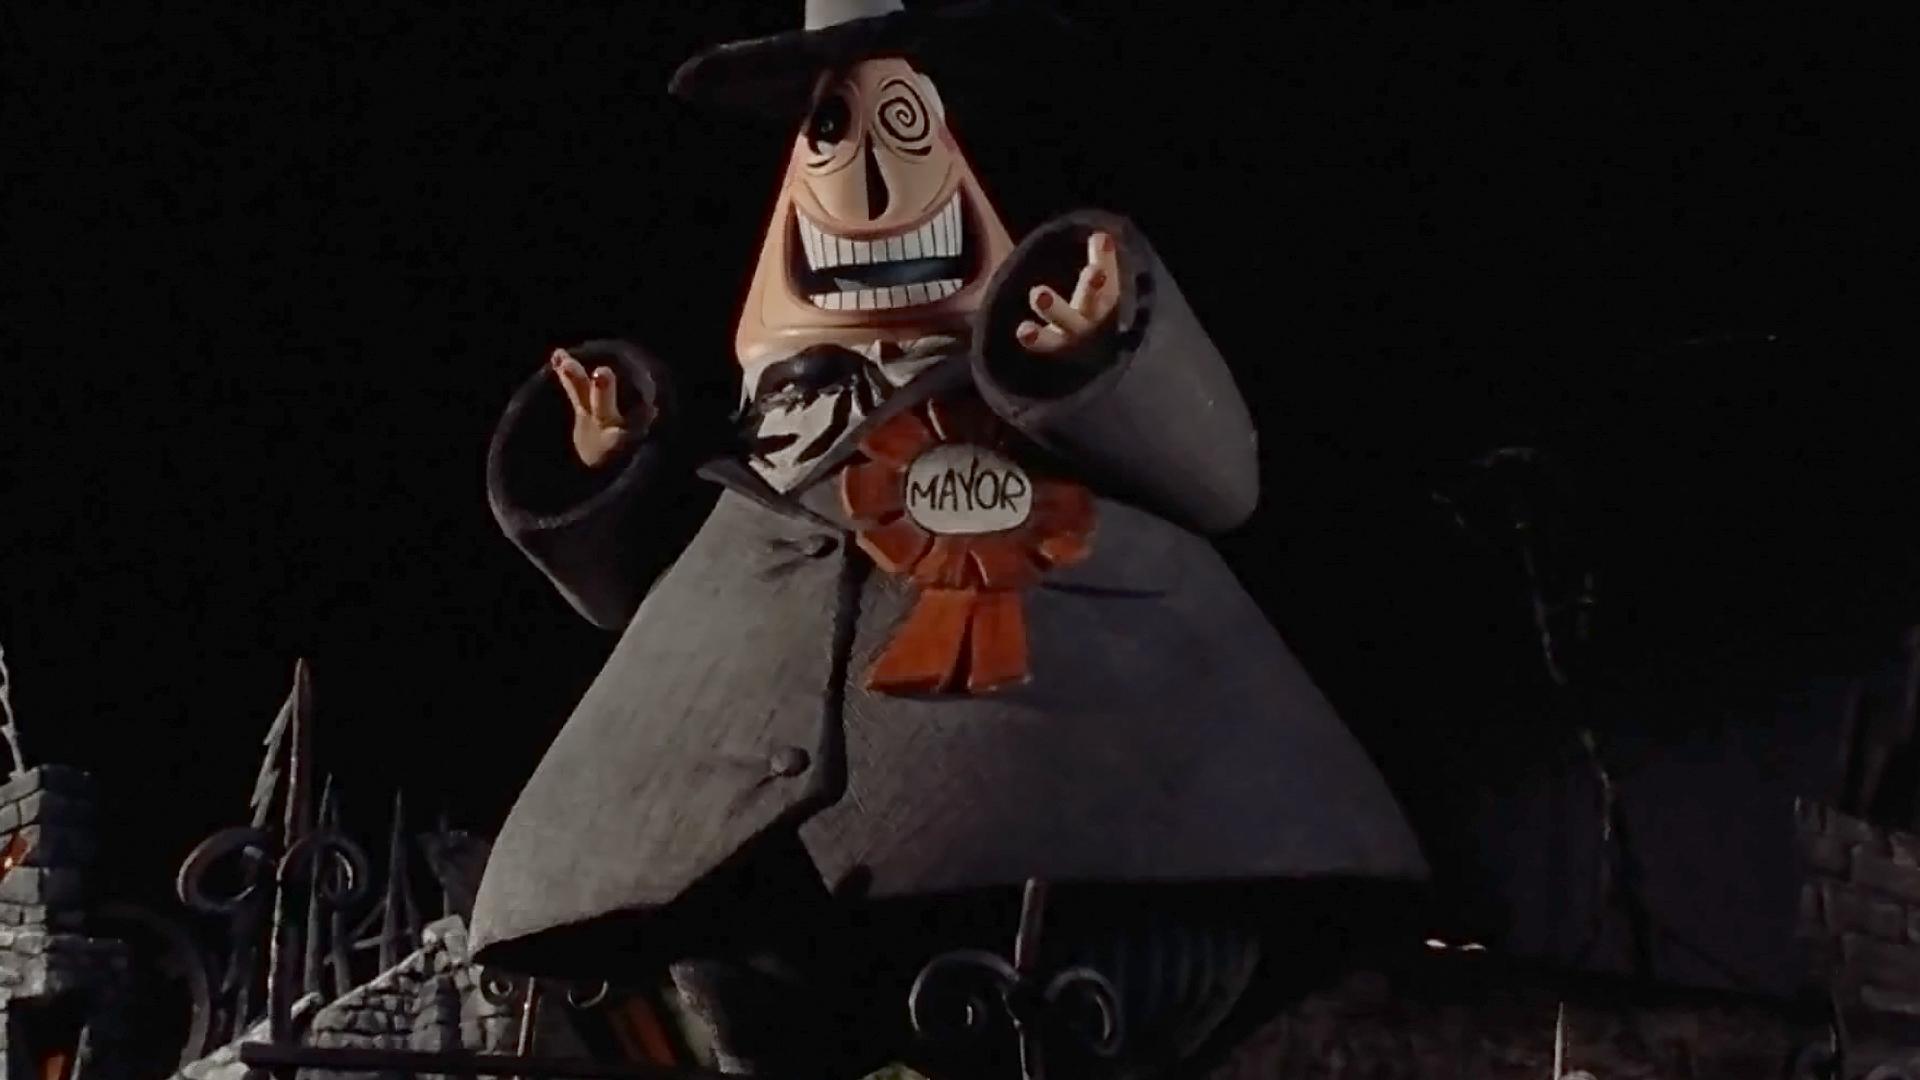 Image - Mayor.jpg | The Nightmare Before Christmas Wiki | FANDOM ...